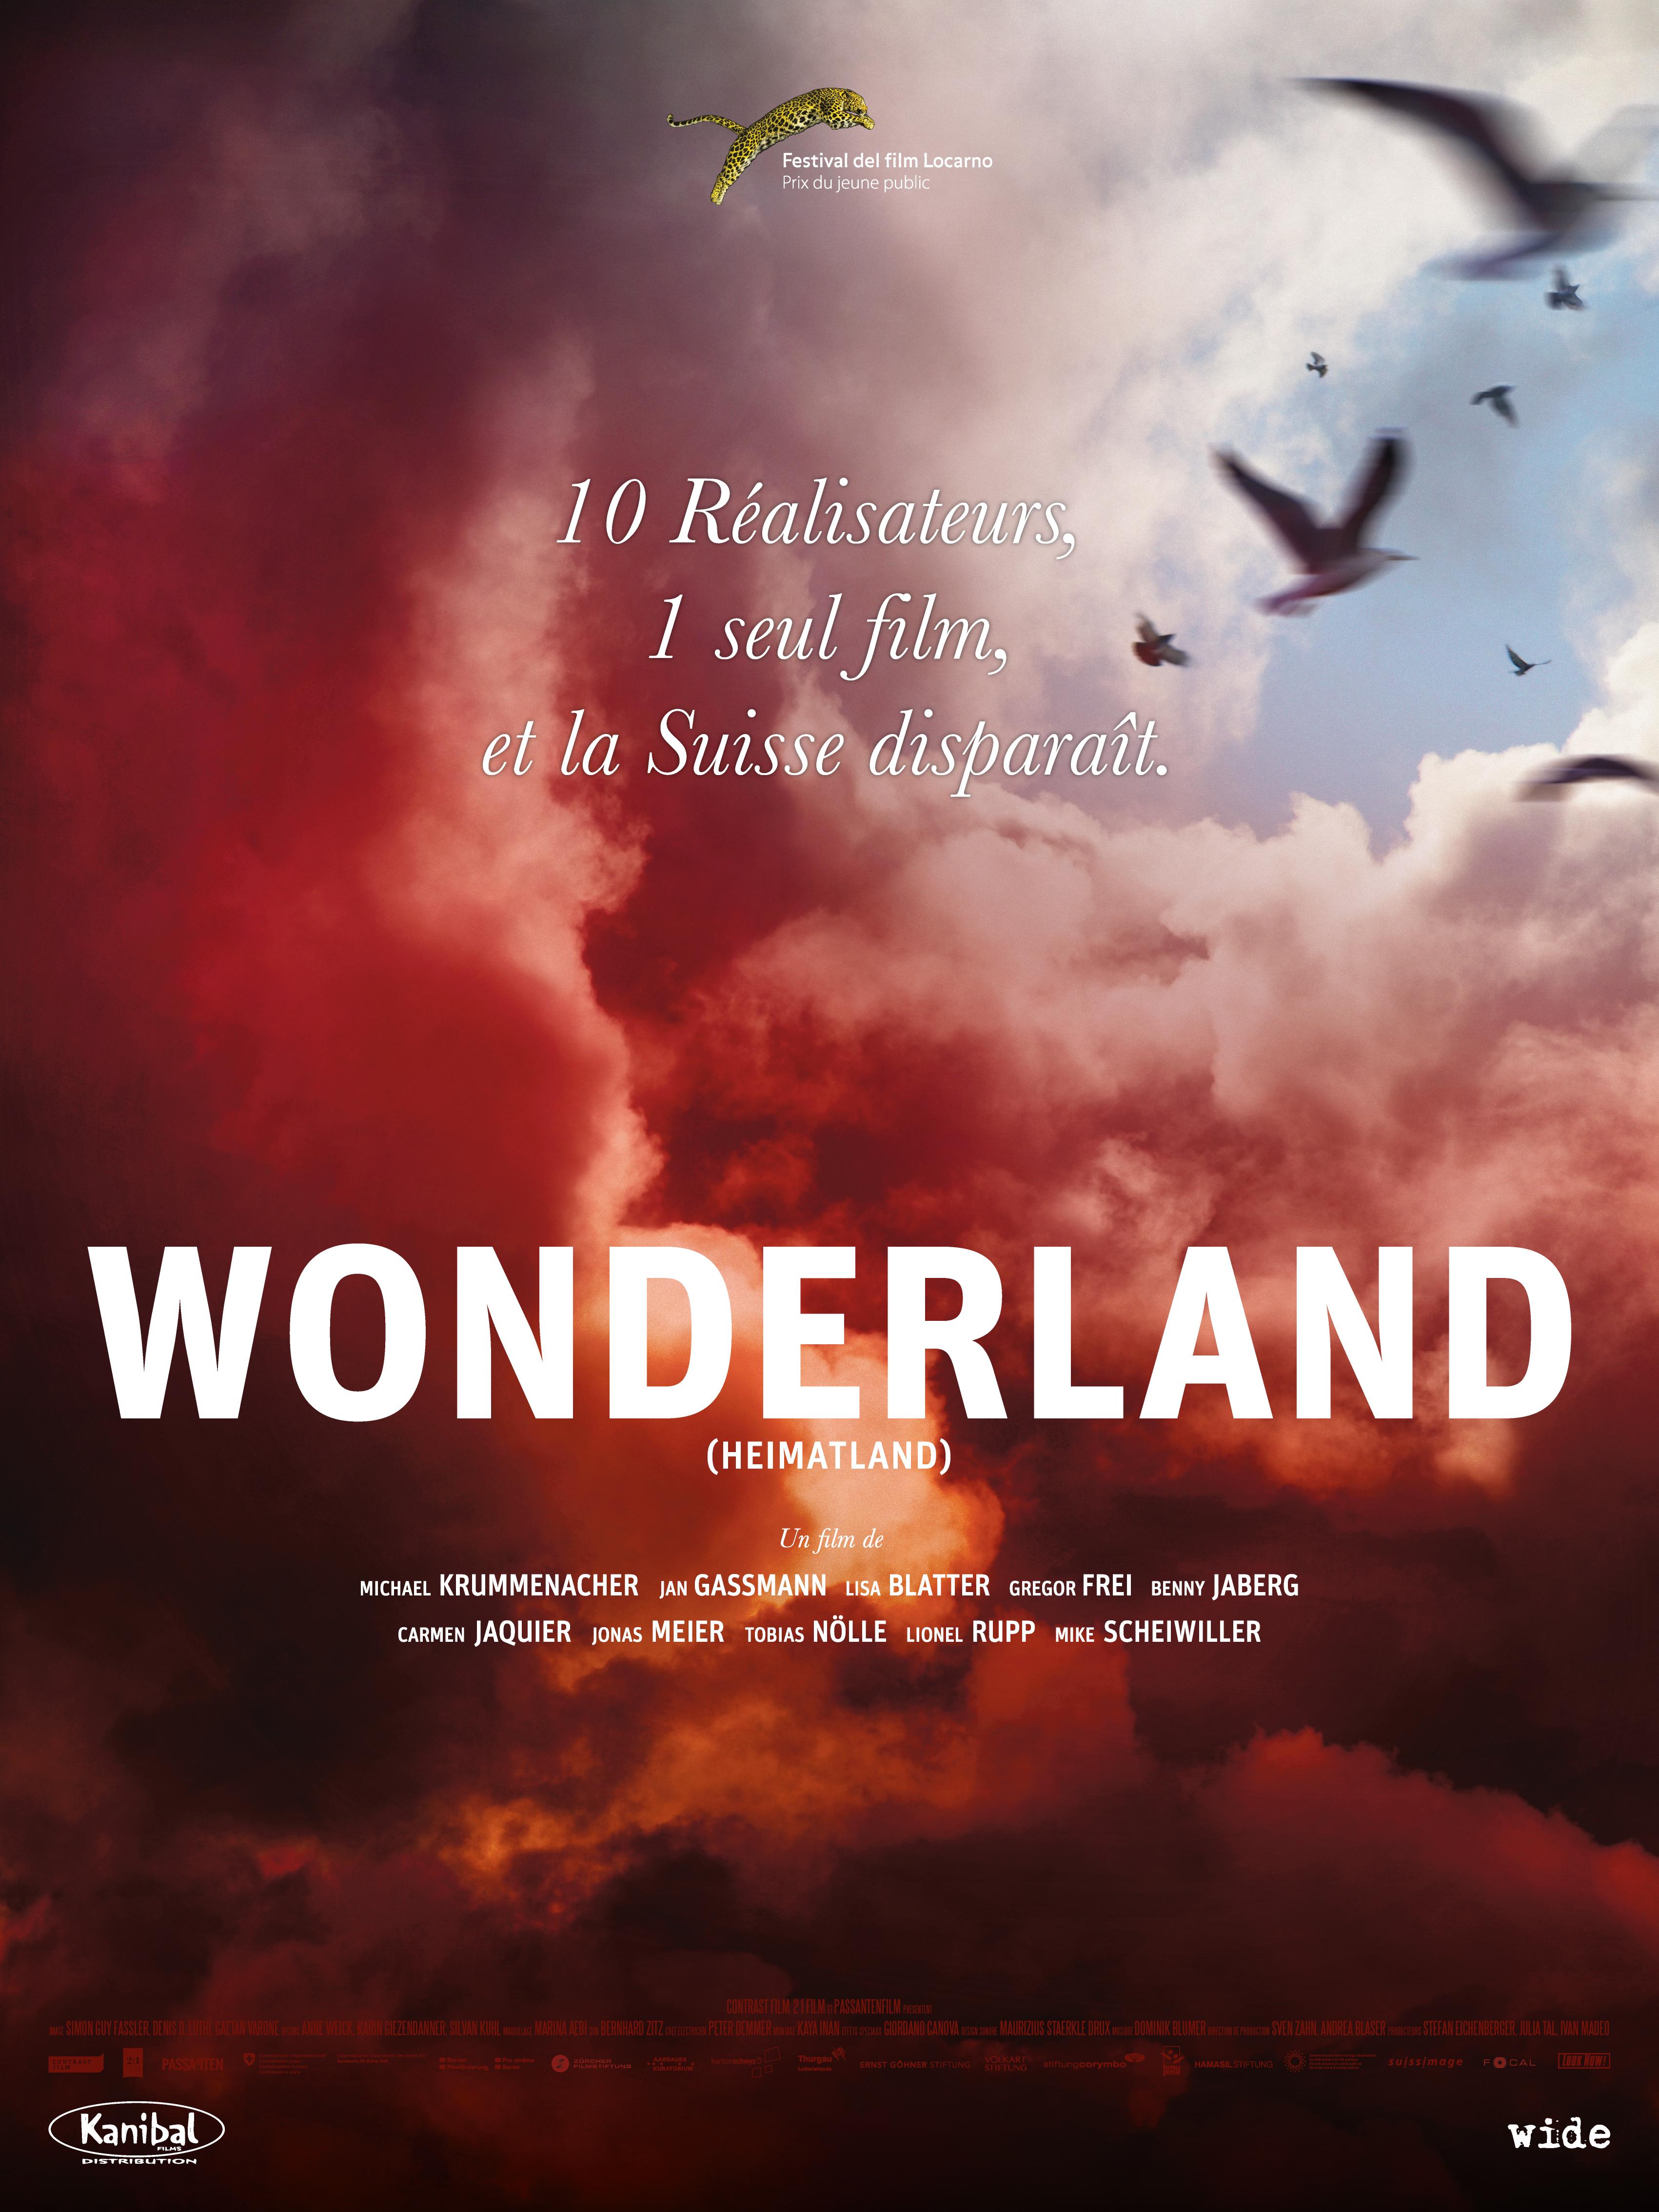 Wonderland_Poster_120x160_V2